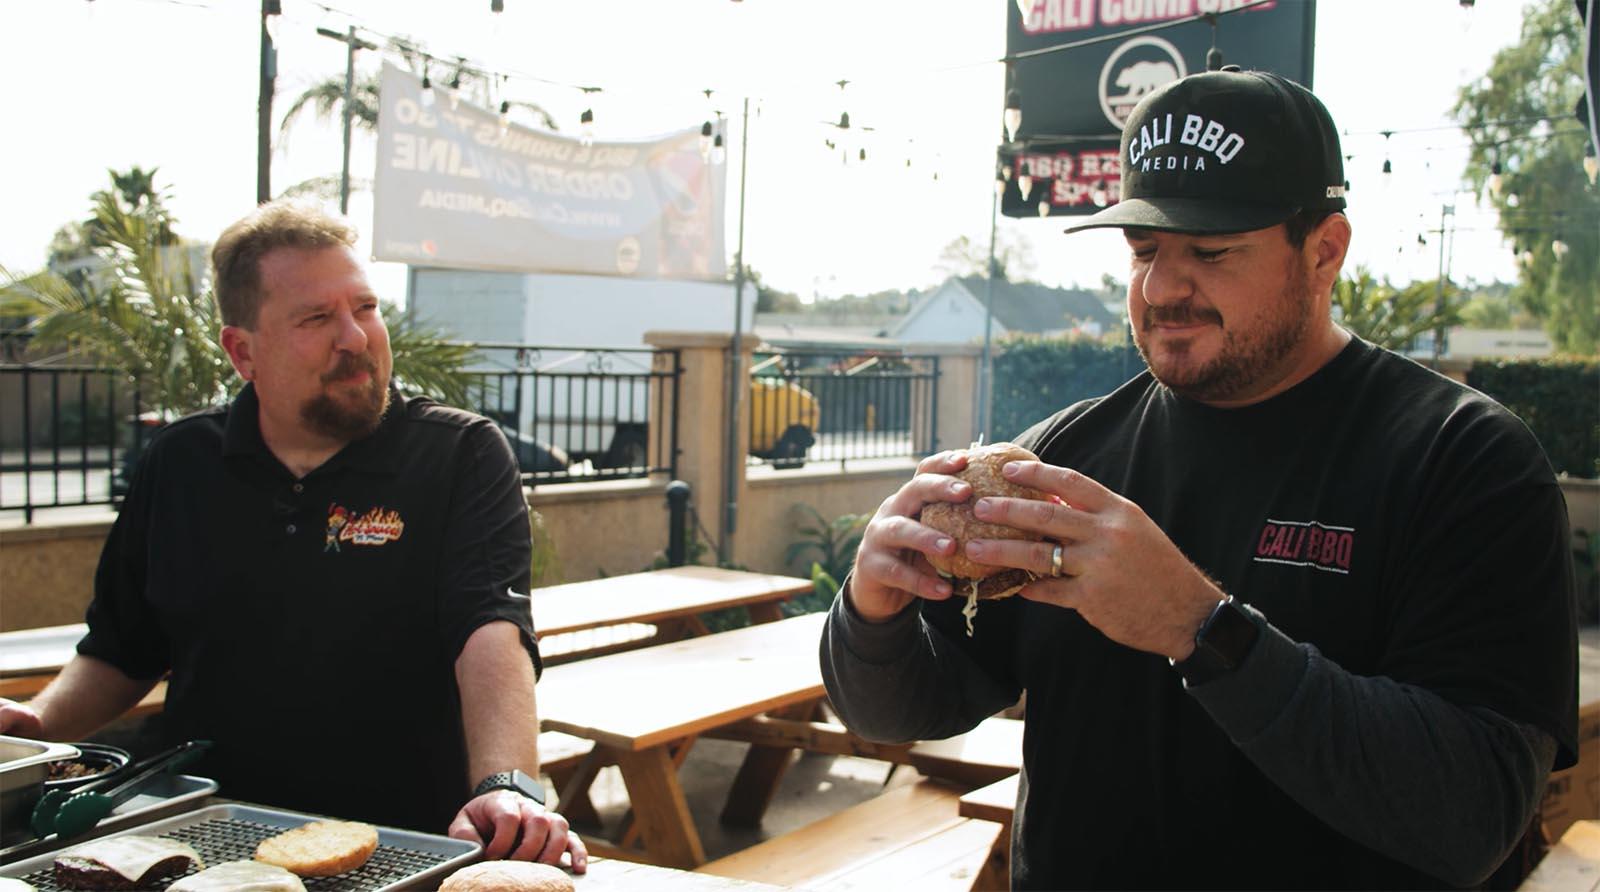 Shawn Walchef of Cali BBQ eats a burger